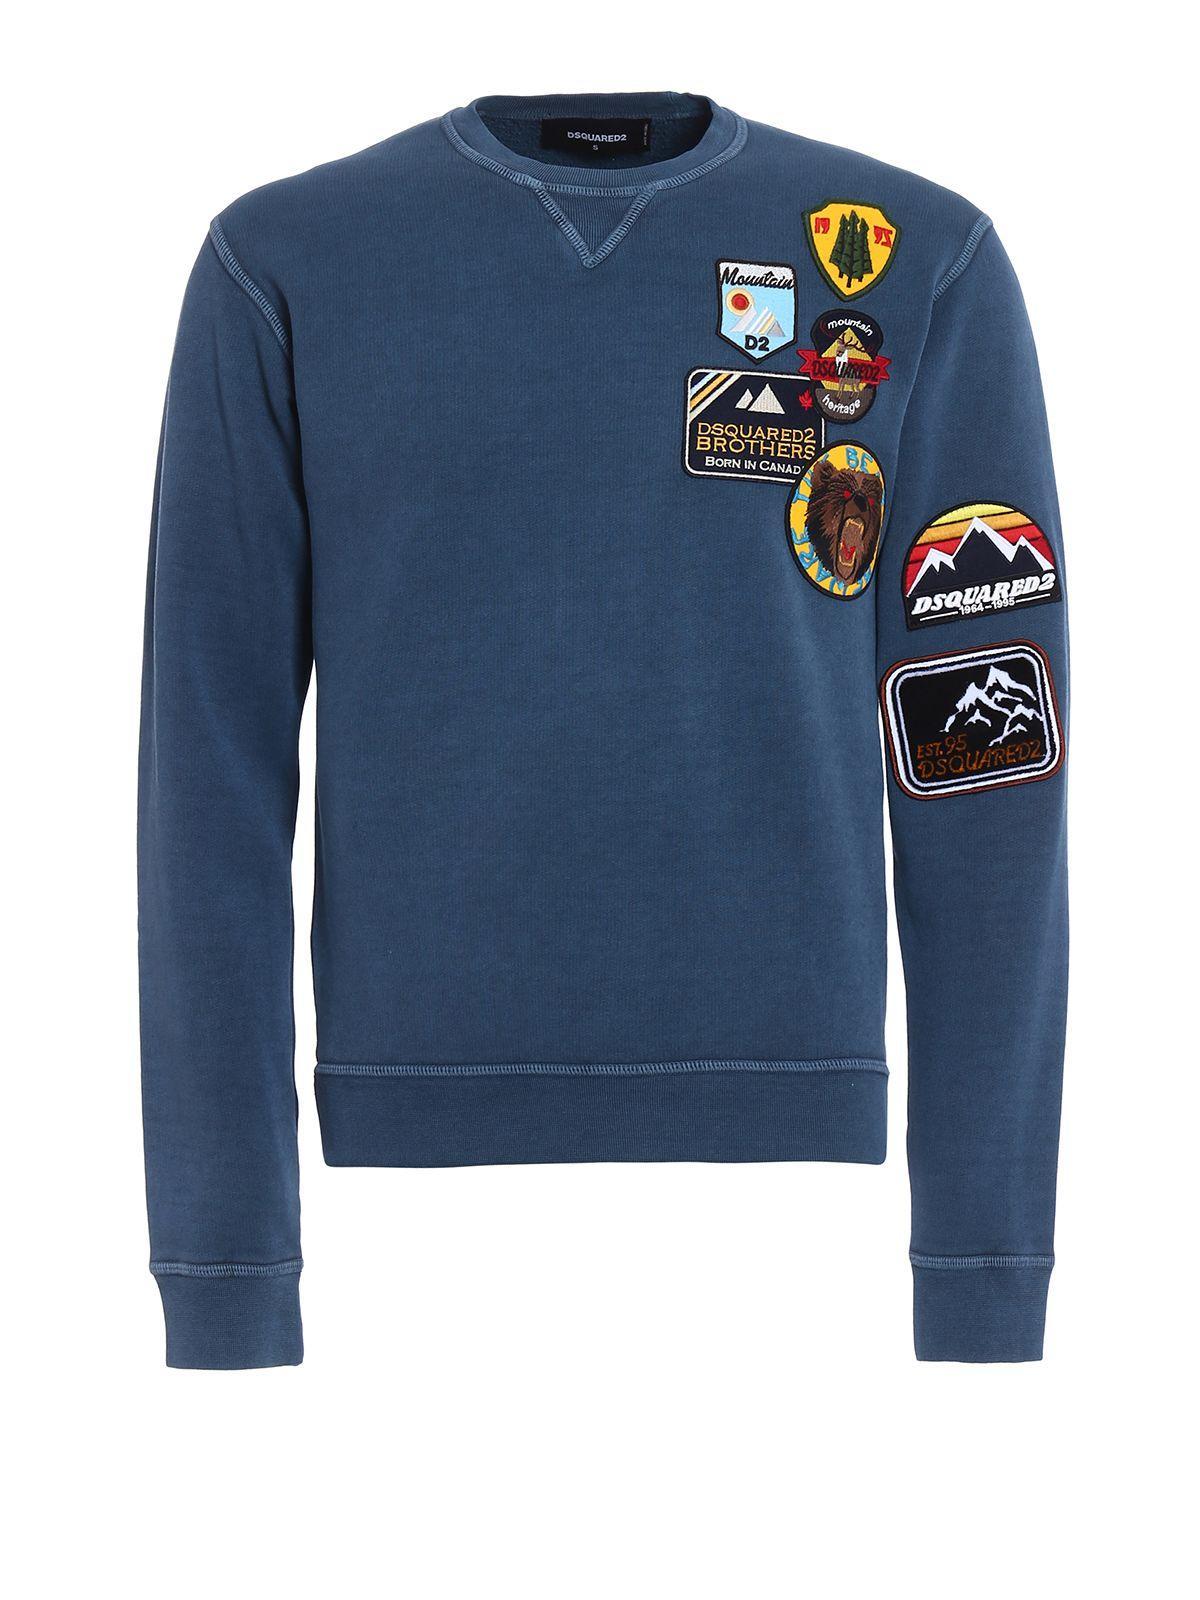 Dsquared2  Sweatshirt Long Sleeve NAVY Colour T-Shirt DSQUARED 2